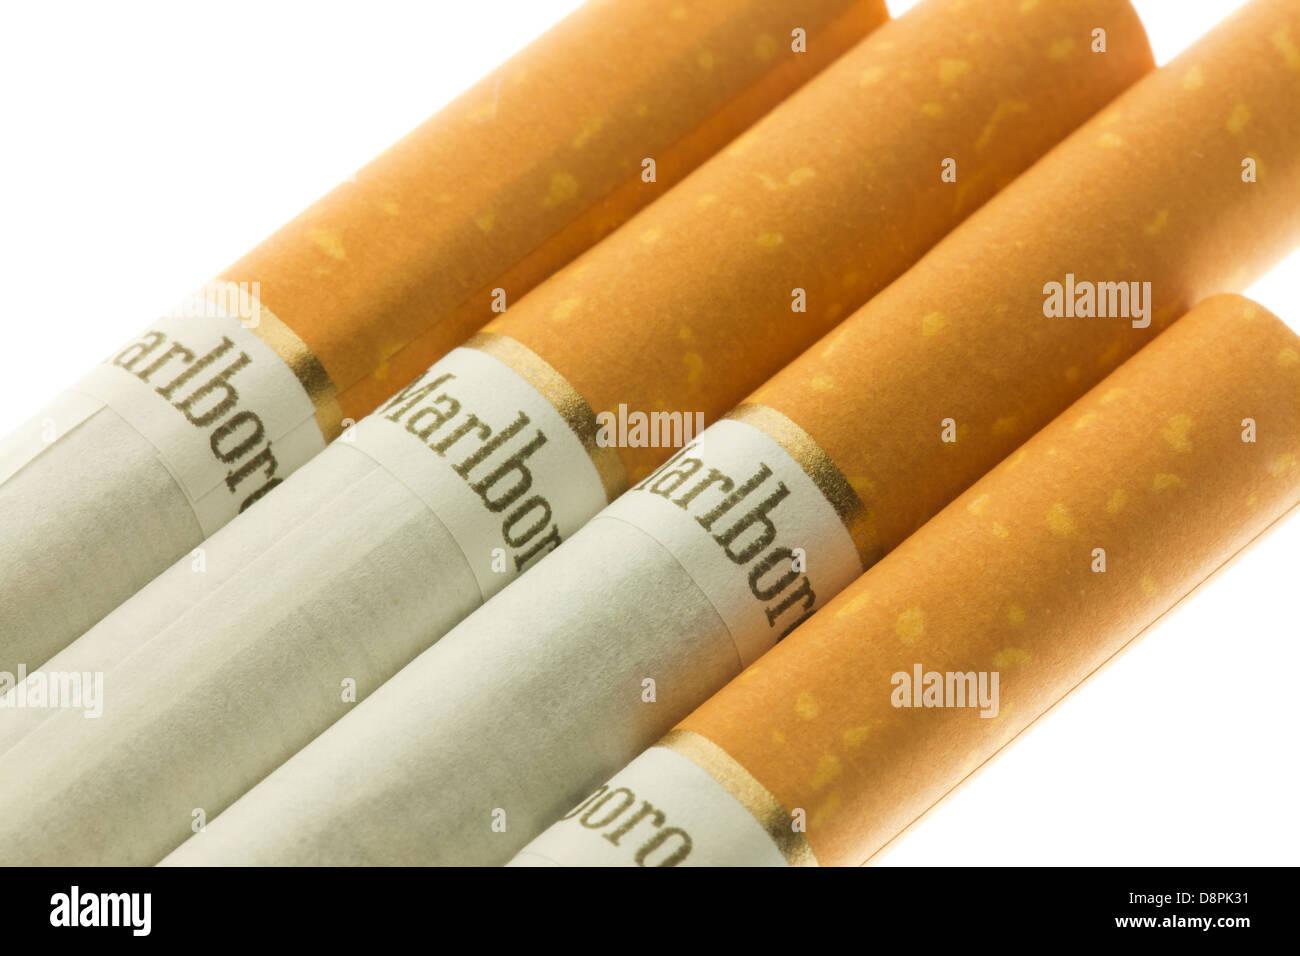 Buy European cigarettes Camel UK